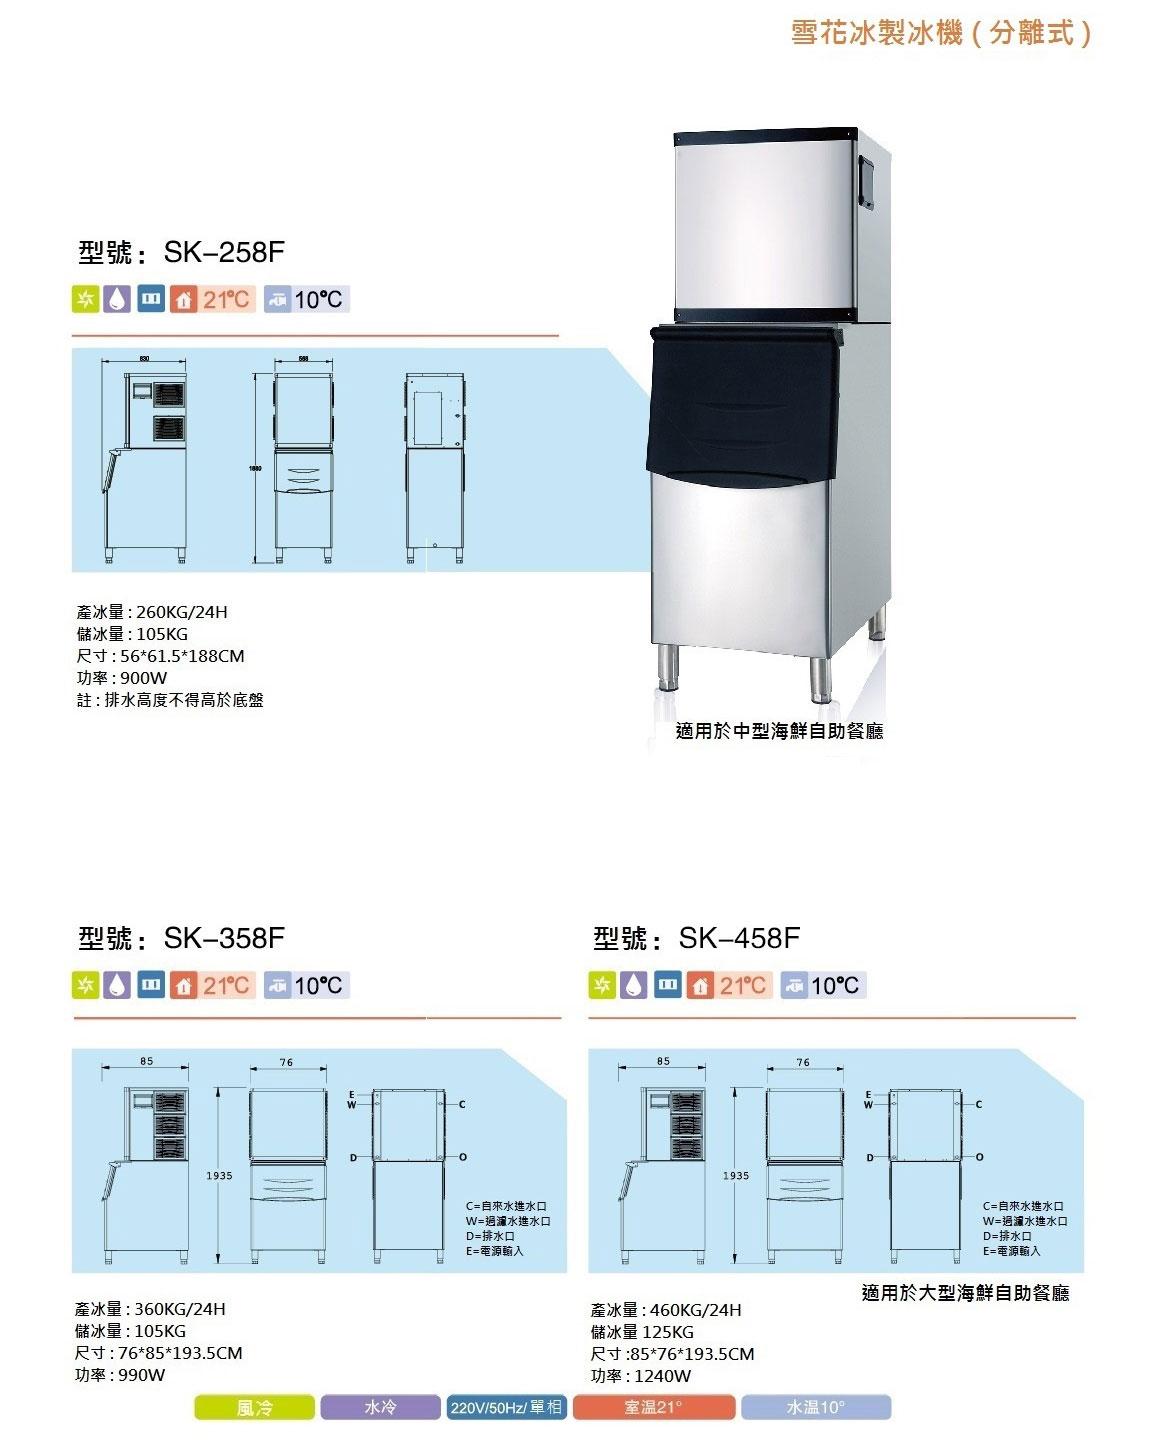 【SK-458F】碎冰製冰機-適用海鮮自助餐廳